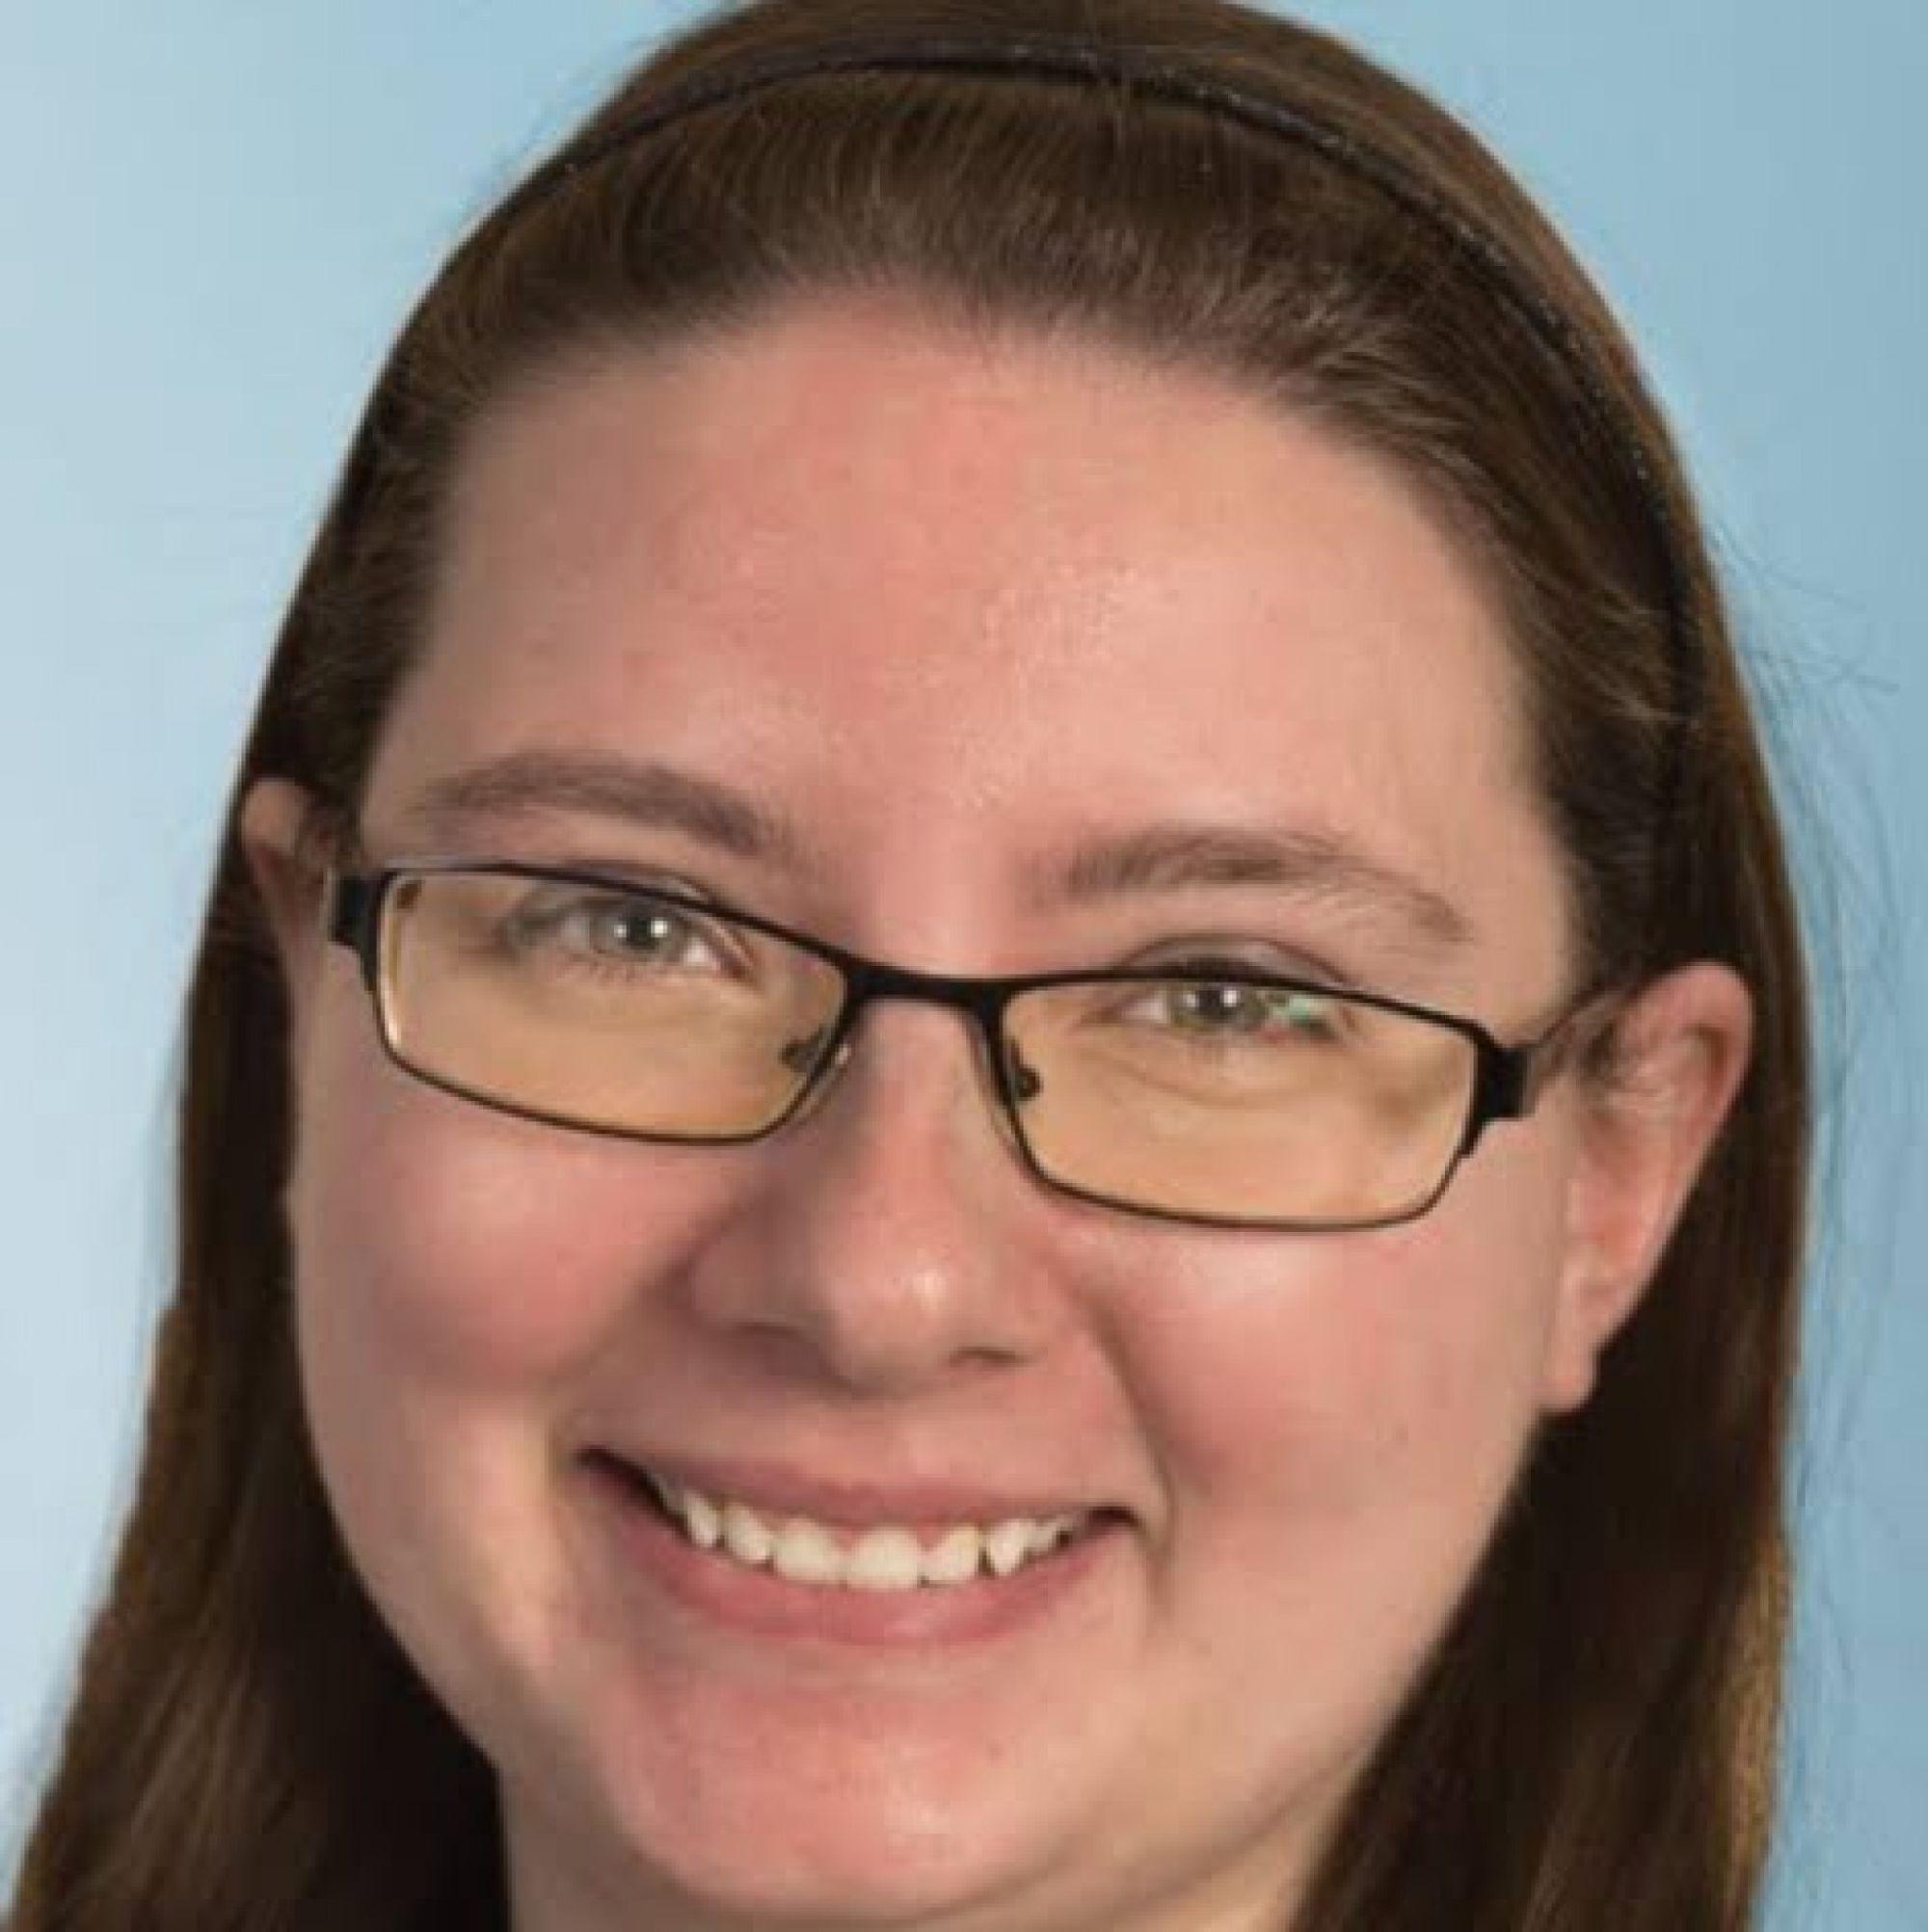 Erin DeGregorio